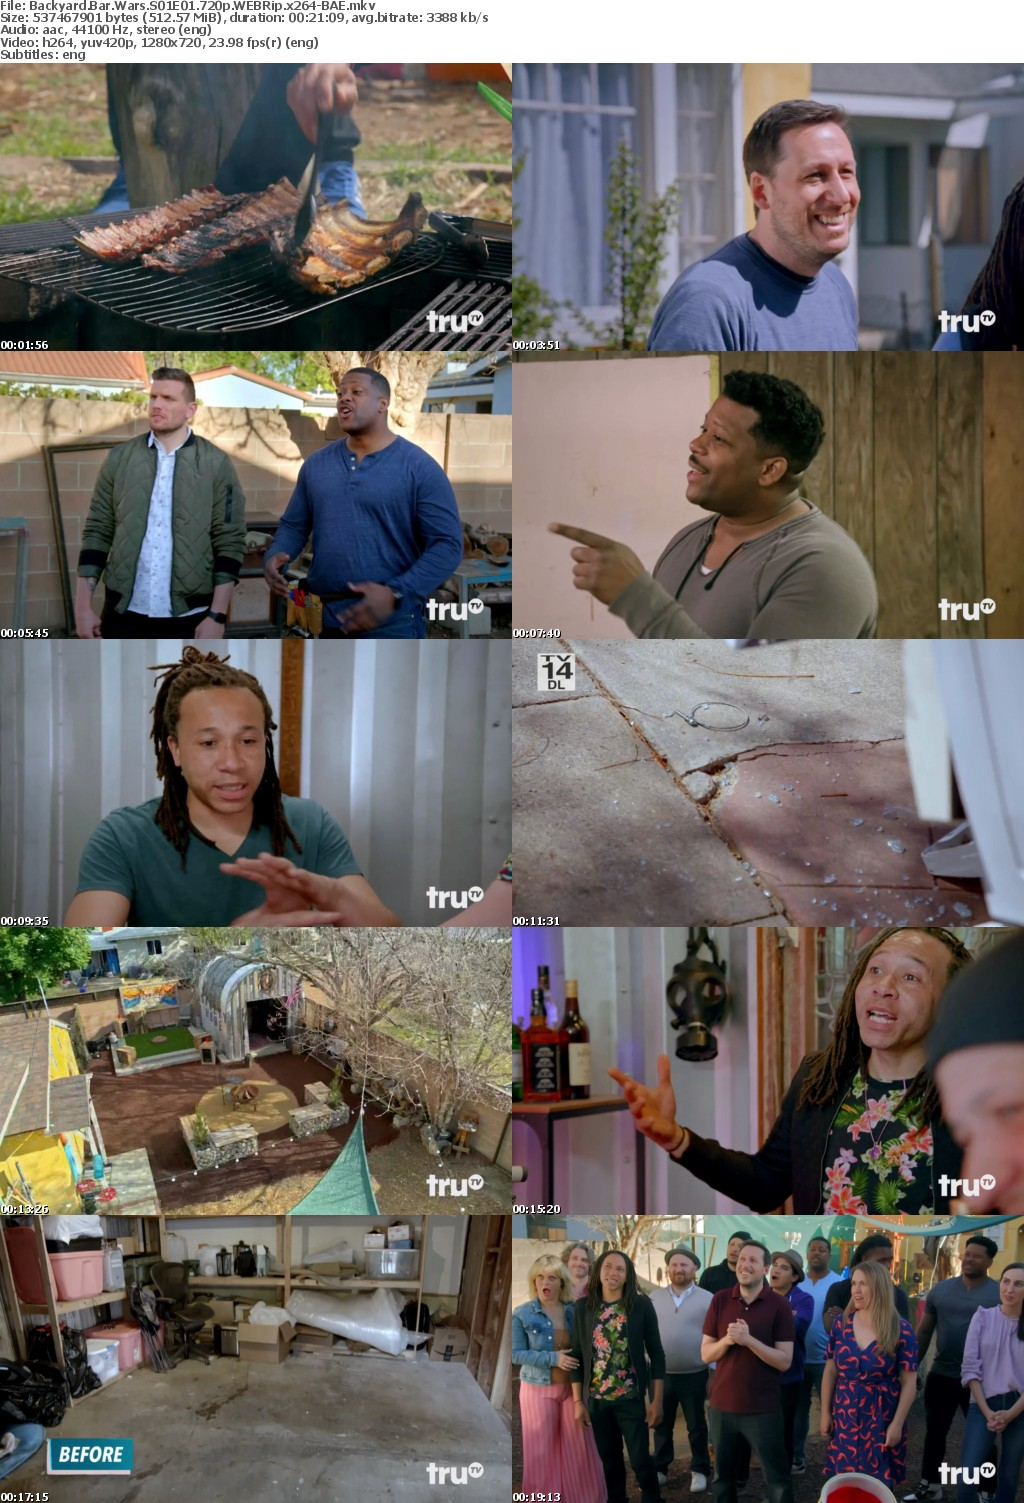 Backyard Bar Wars S01E01 720p WEBRip x264-BAE